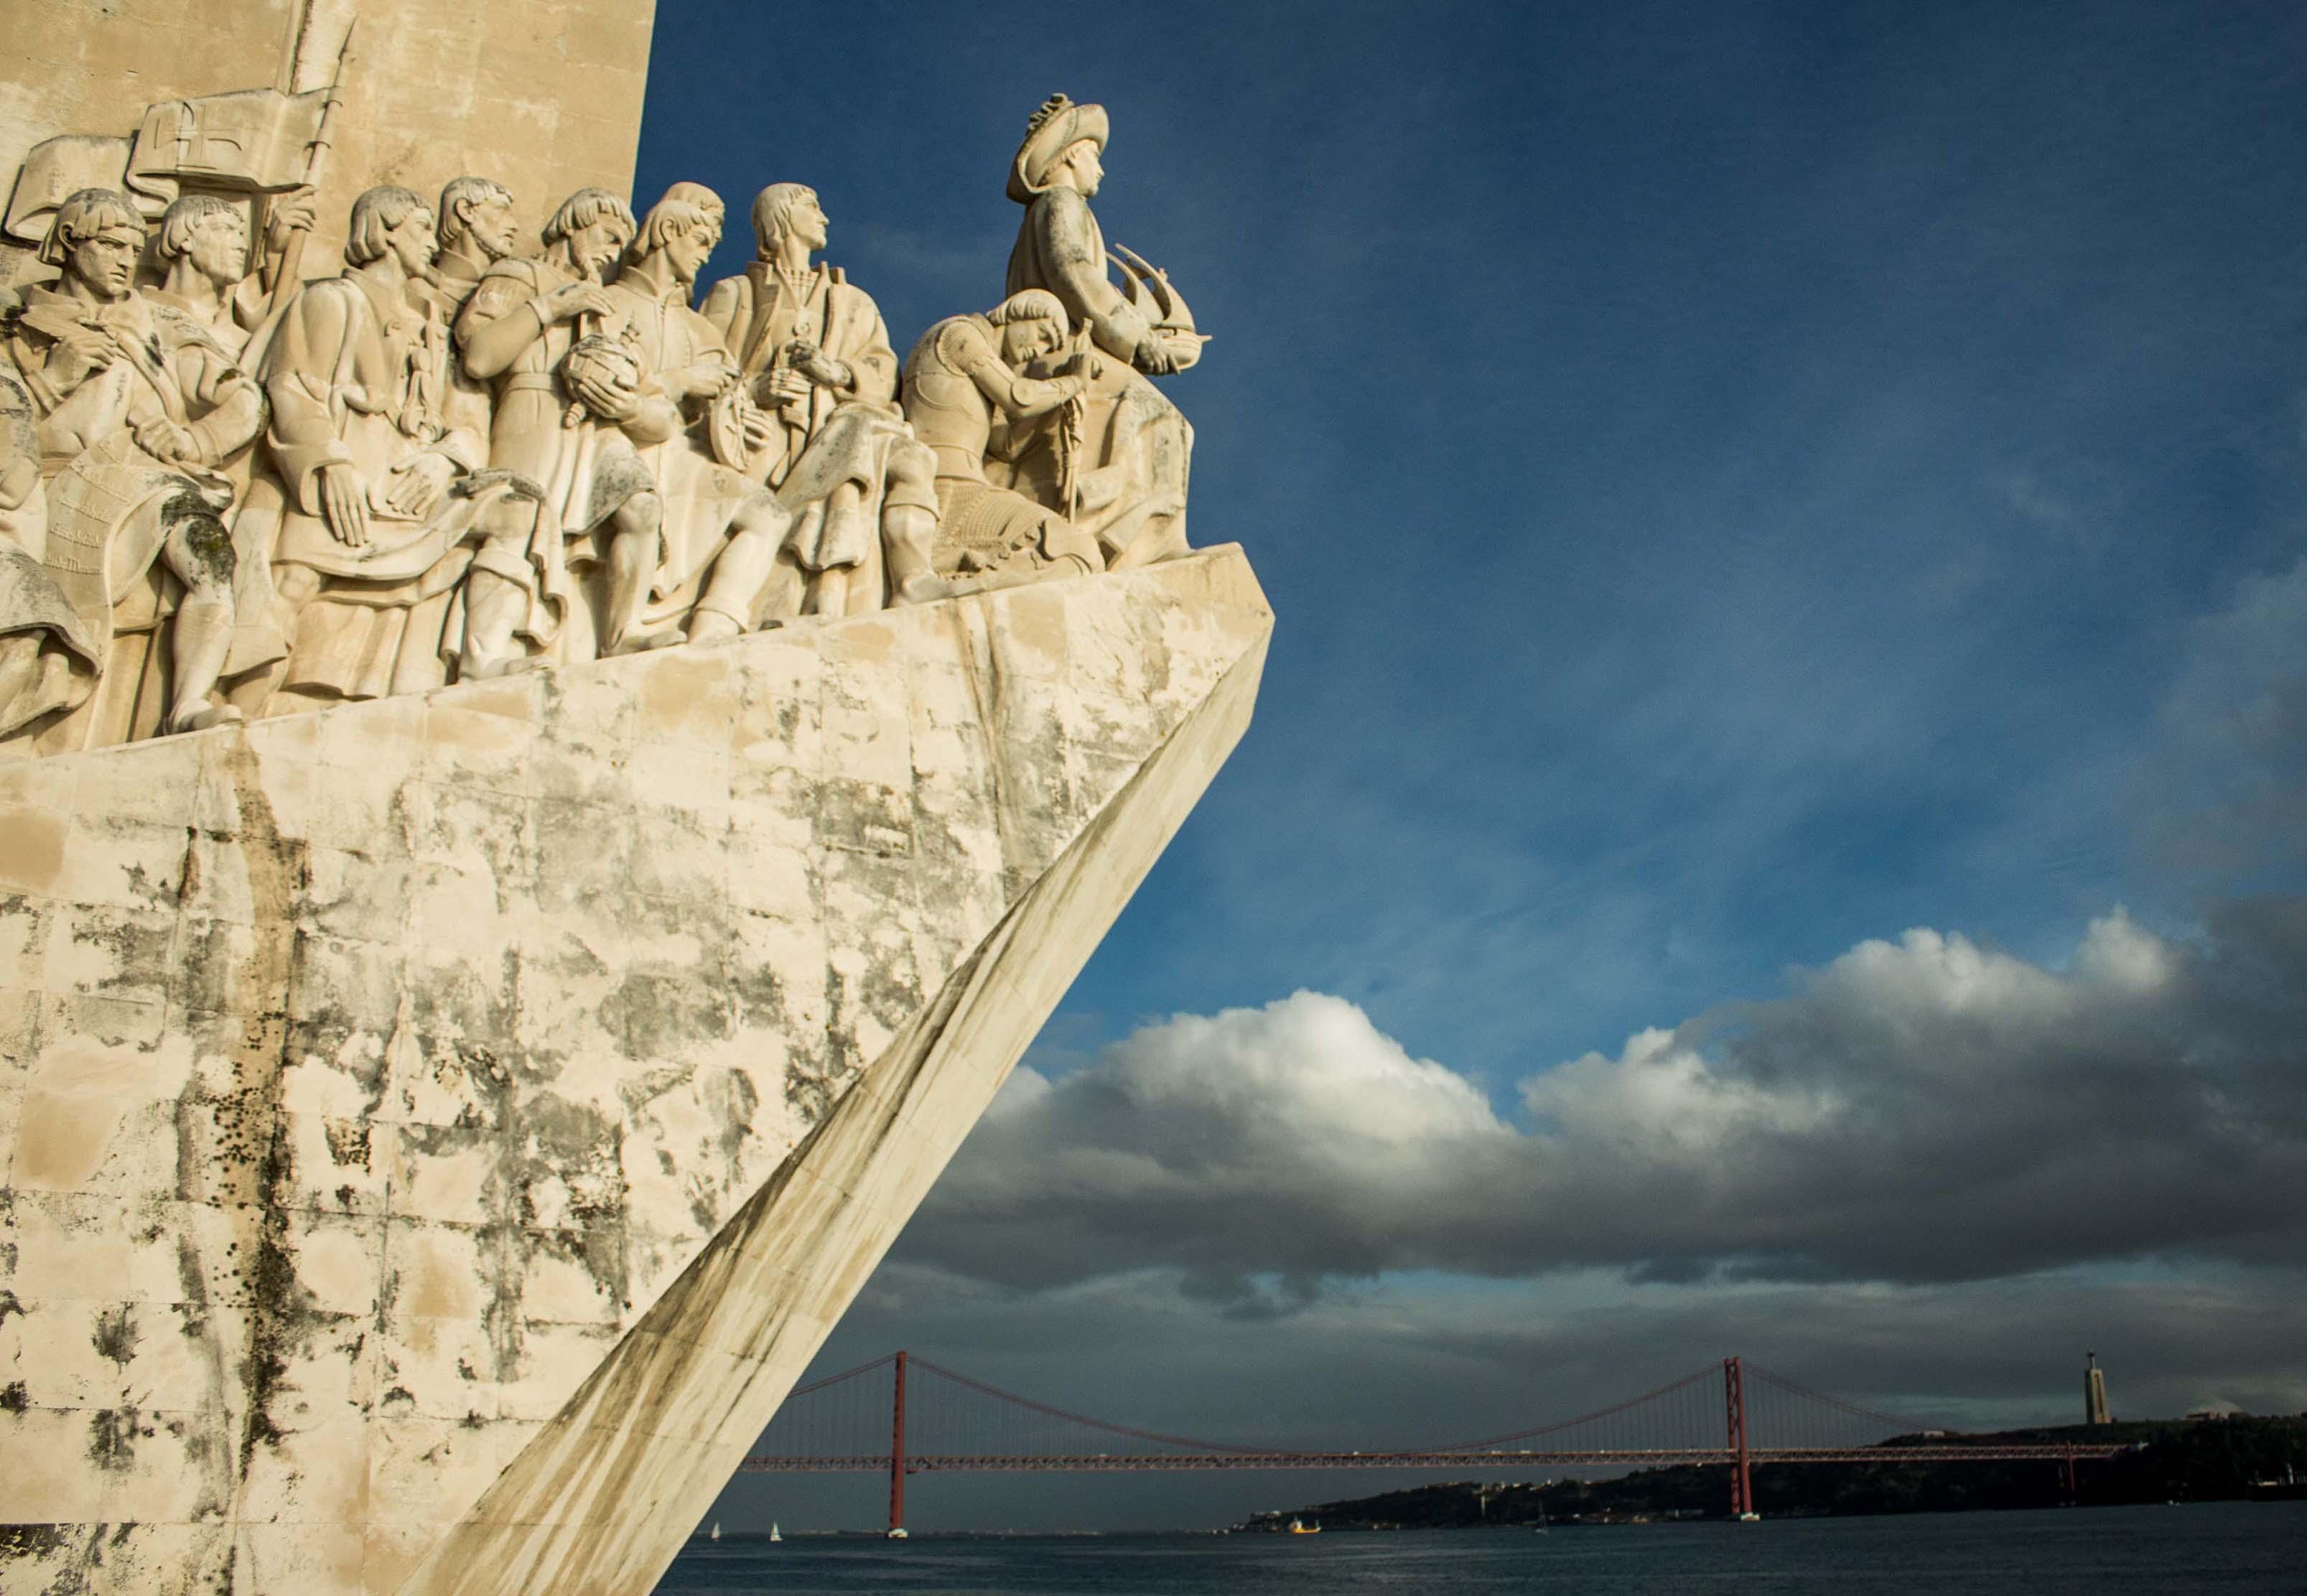 Seefahrerdenkmal